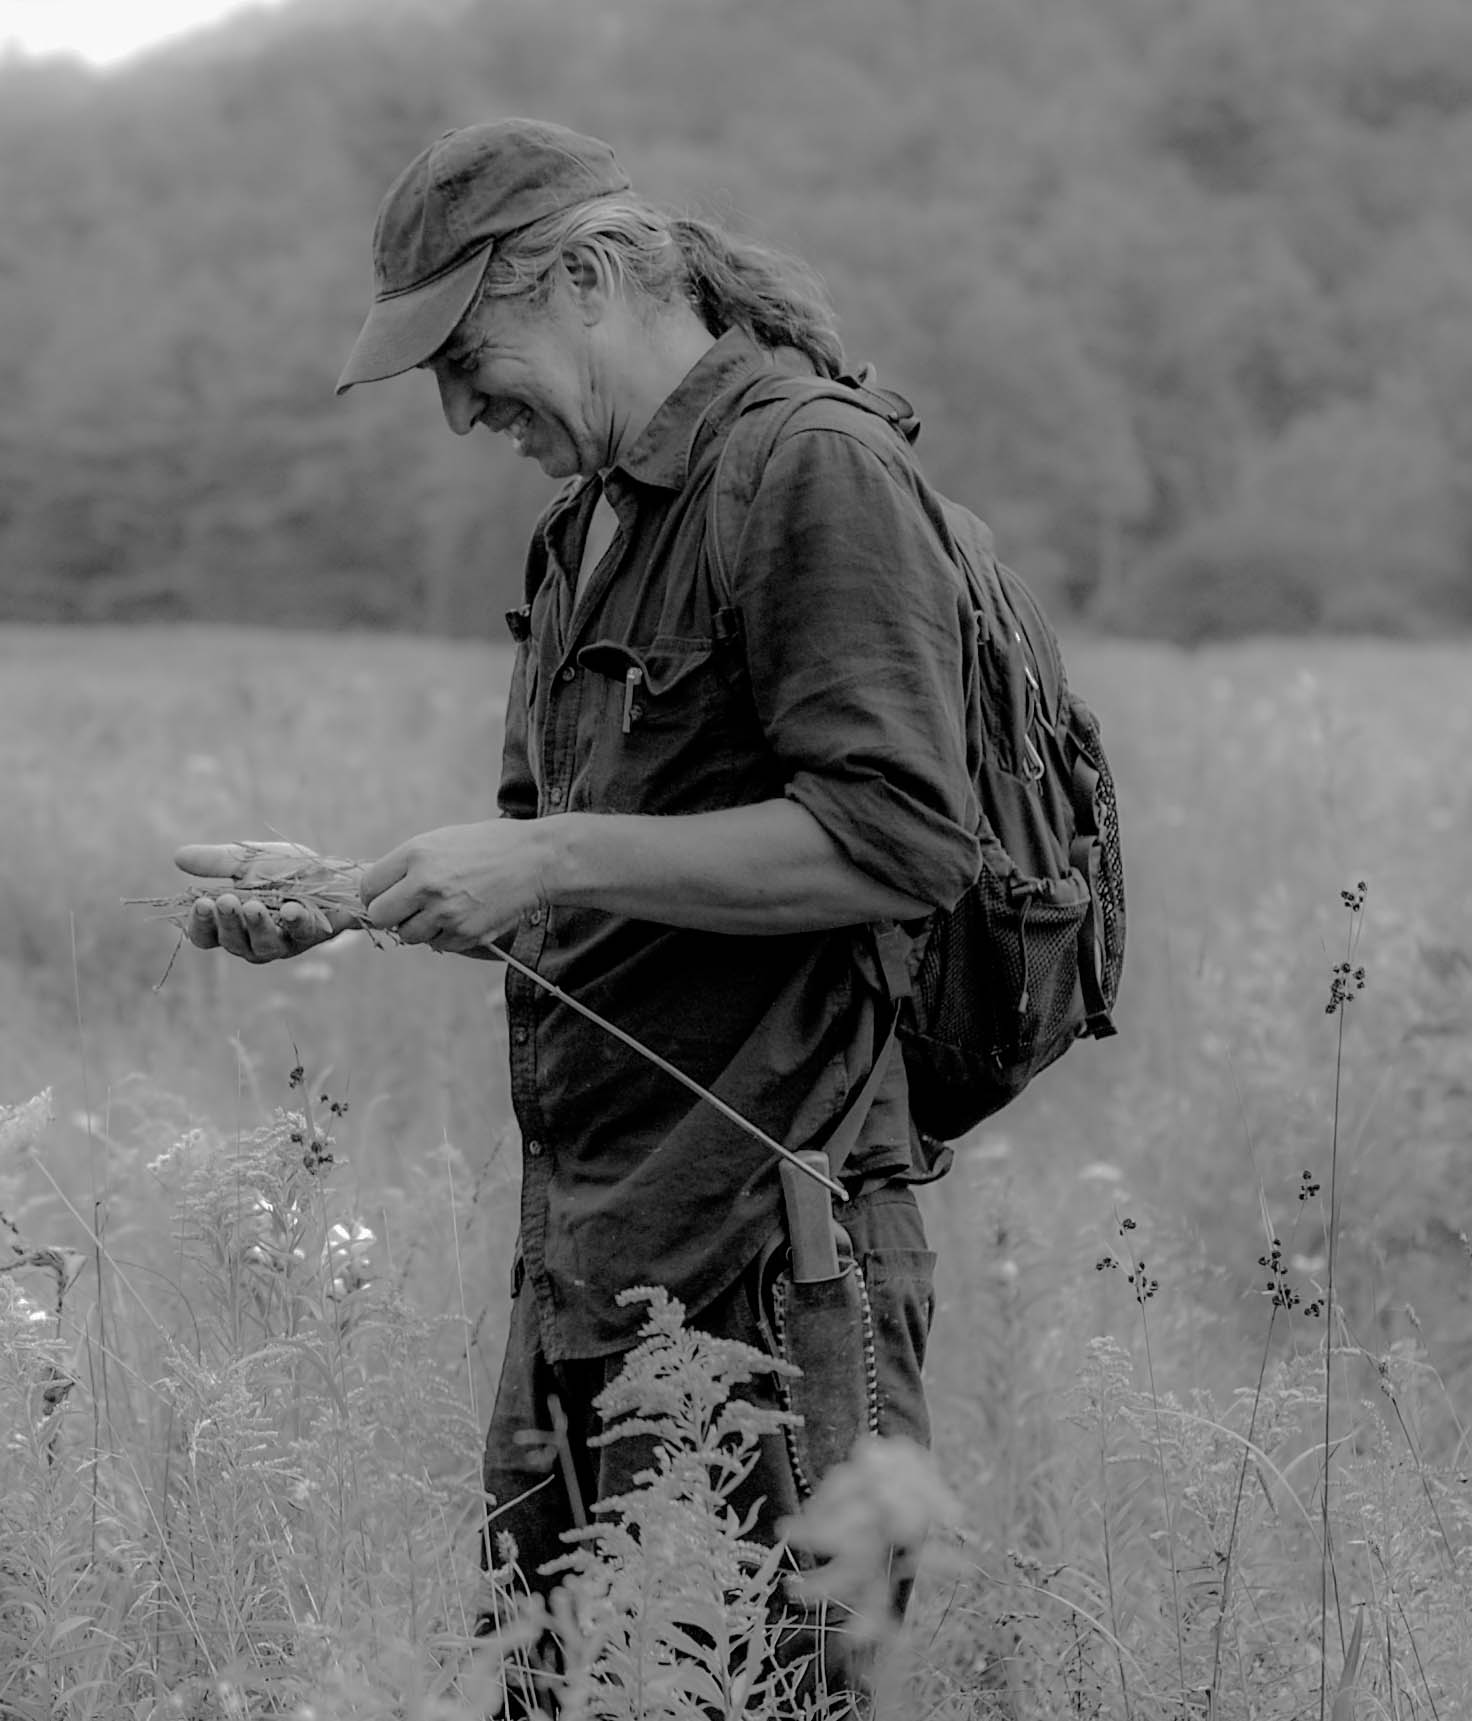 7Song-Adirondack Field Trip-Photo by Chanti-Paul Smiths, NY-Aug 10, 2017 (2 of 2).jpg